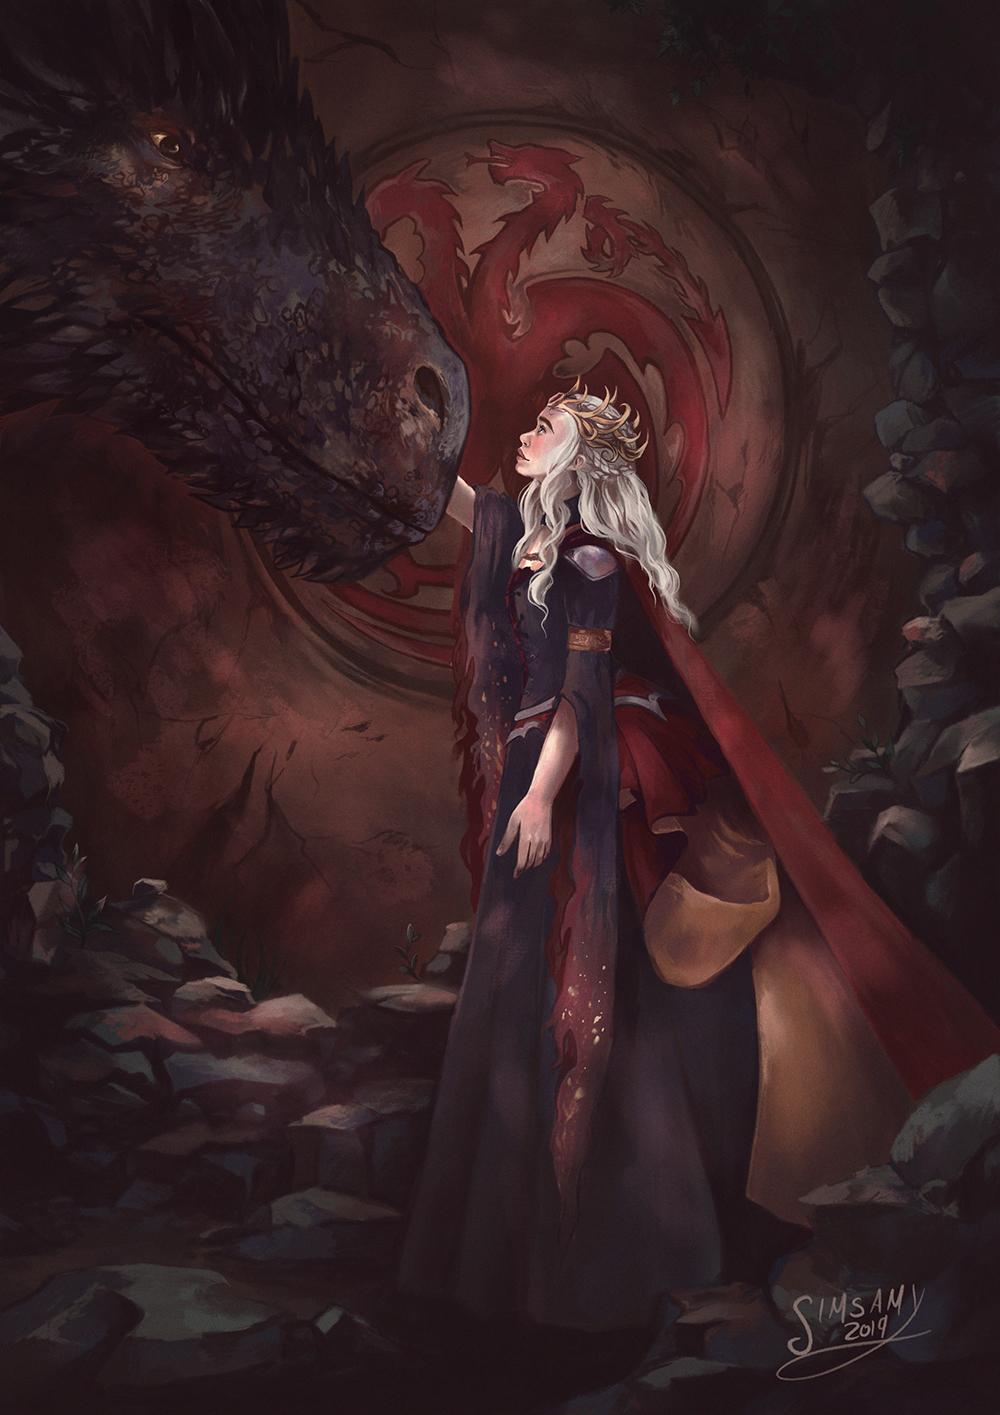 Daenerys Targaryen-The Dragon Queen